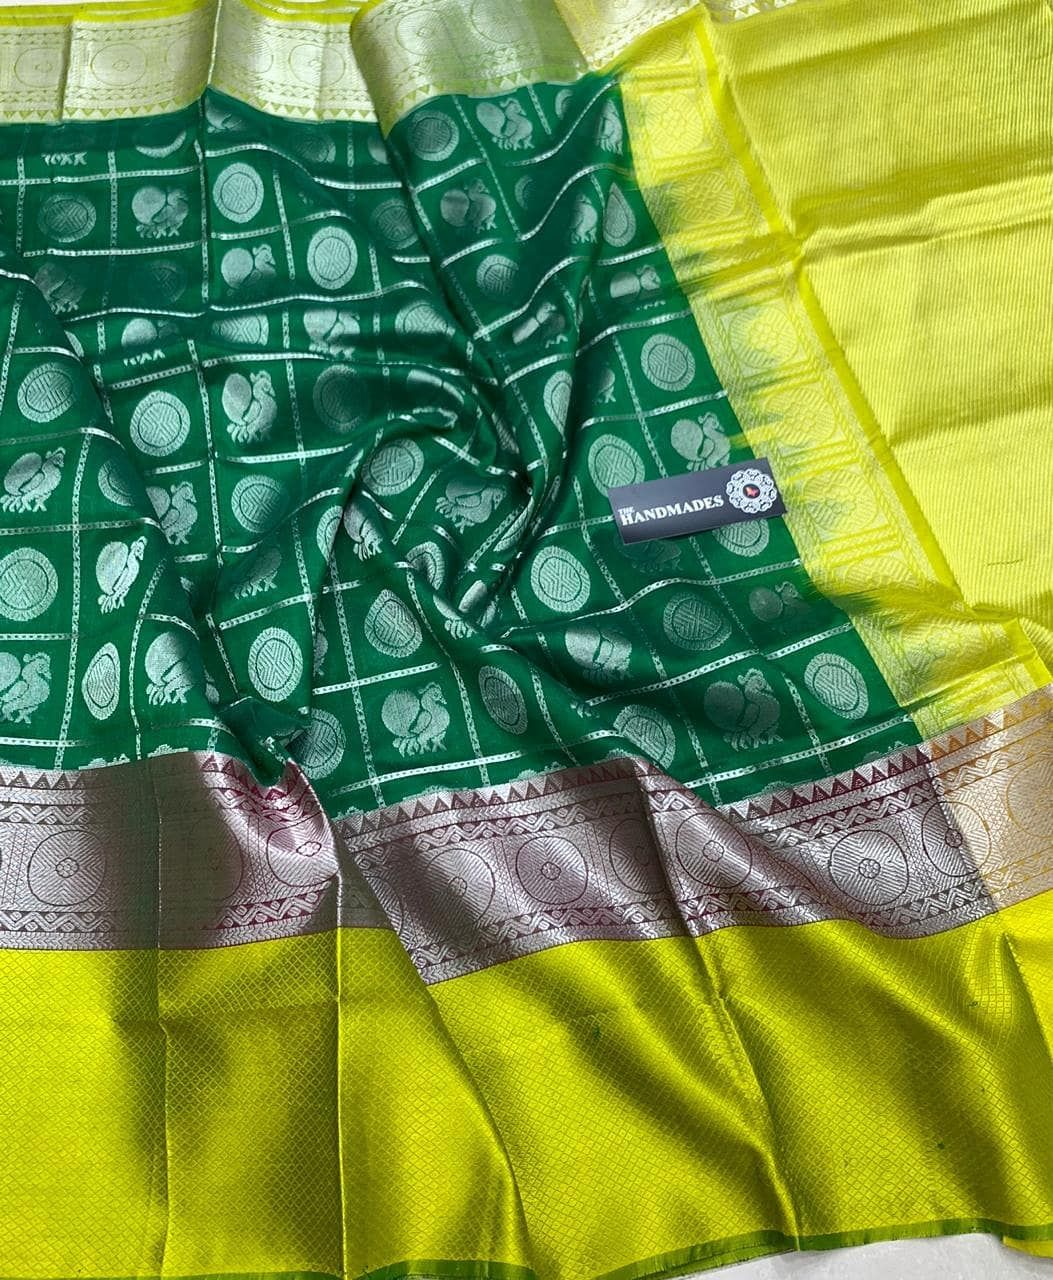 40f9b3a0e1168  Designer  Kuppadam  Silk  Sarees with  Silver  gold  Jari Borders   Buttas    Contrast Rich  Pallu   Contrast Plain  Blouse Mhm   Rs.…